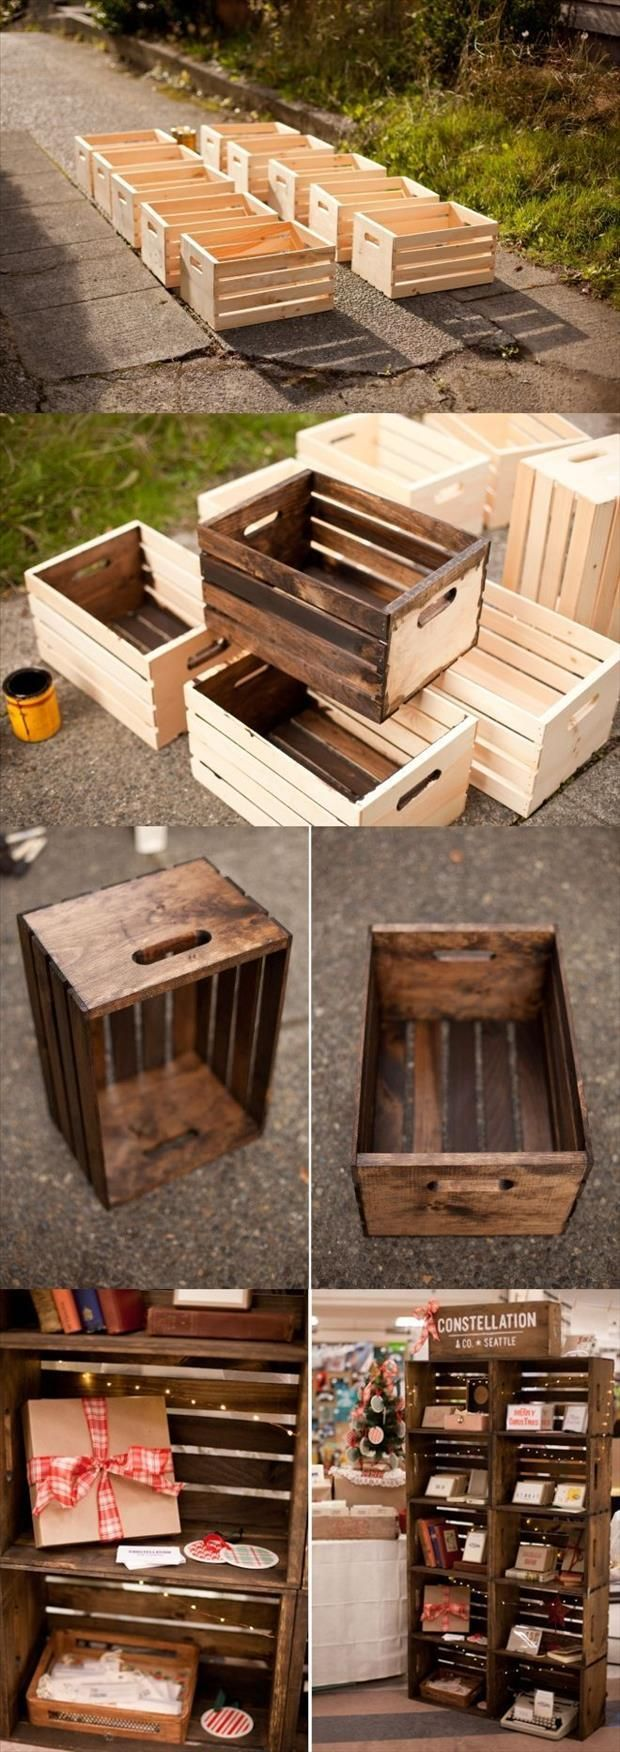 Pallet Kitchen Table With Storage